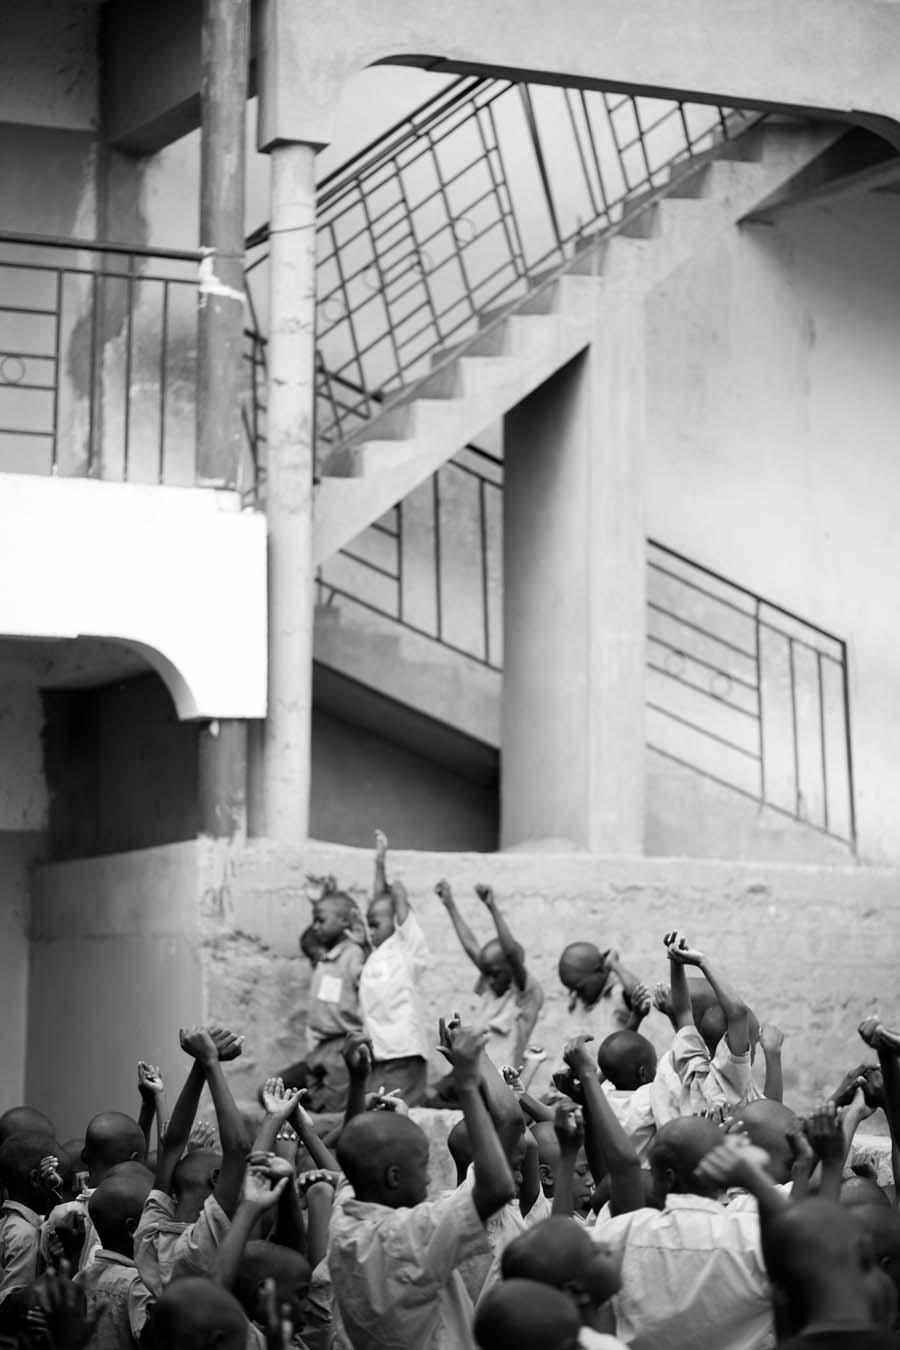 jessicadavisphotography.com | Jessica Davis Photography | Portrait Work in Uganda| Travel Photographer | World Event Photographs 0 (6).jpg